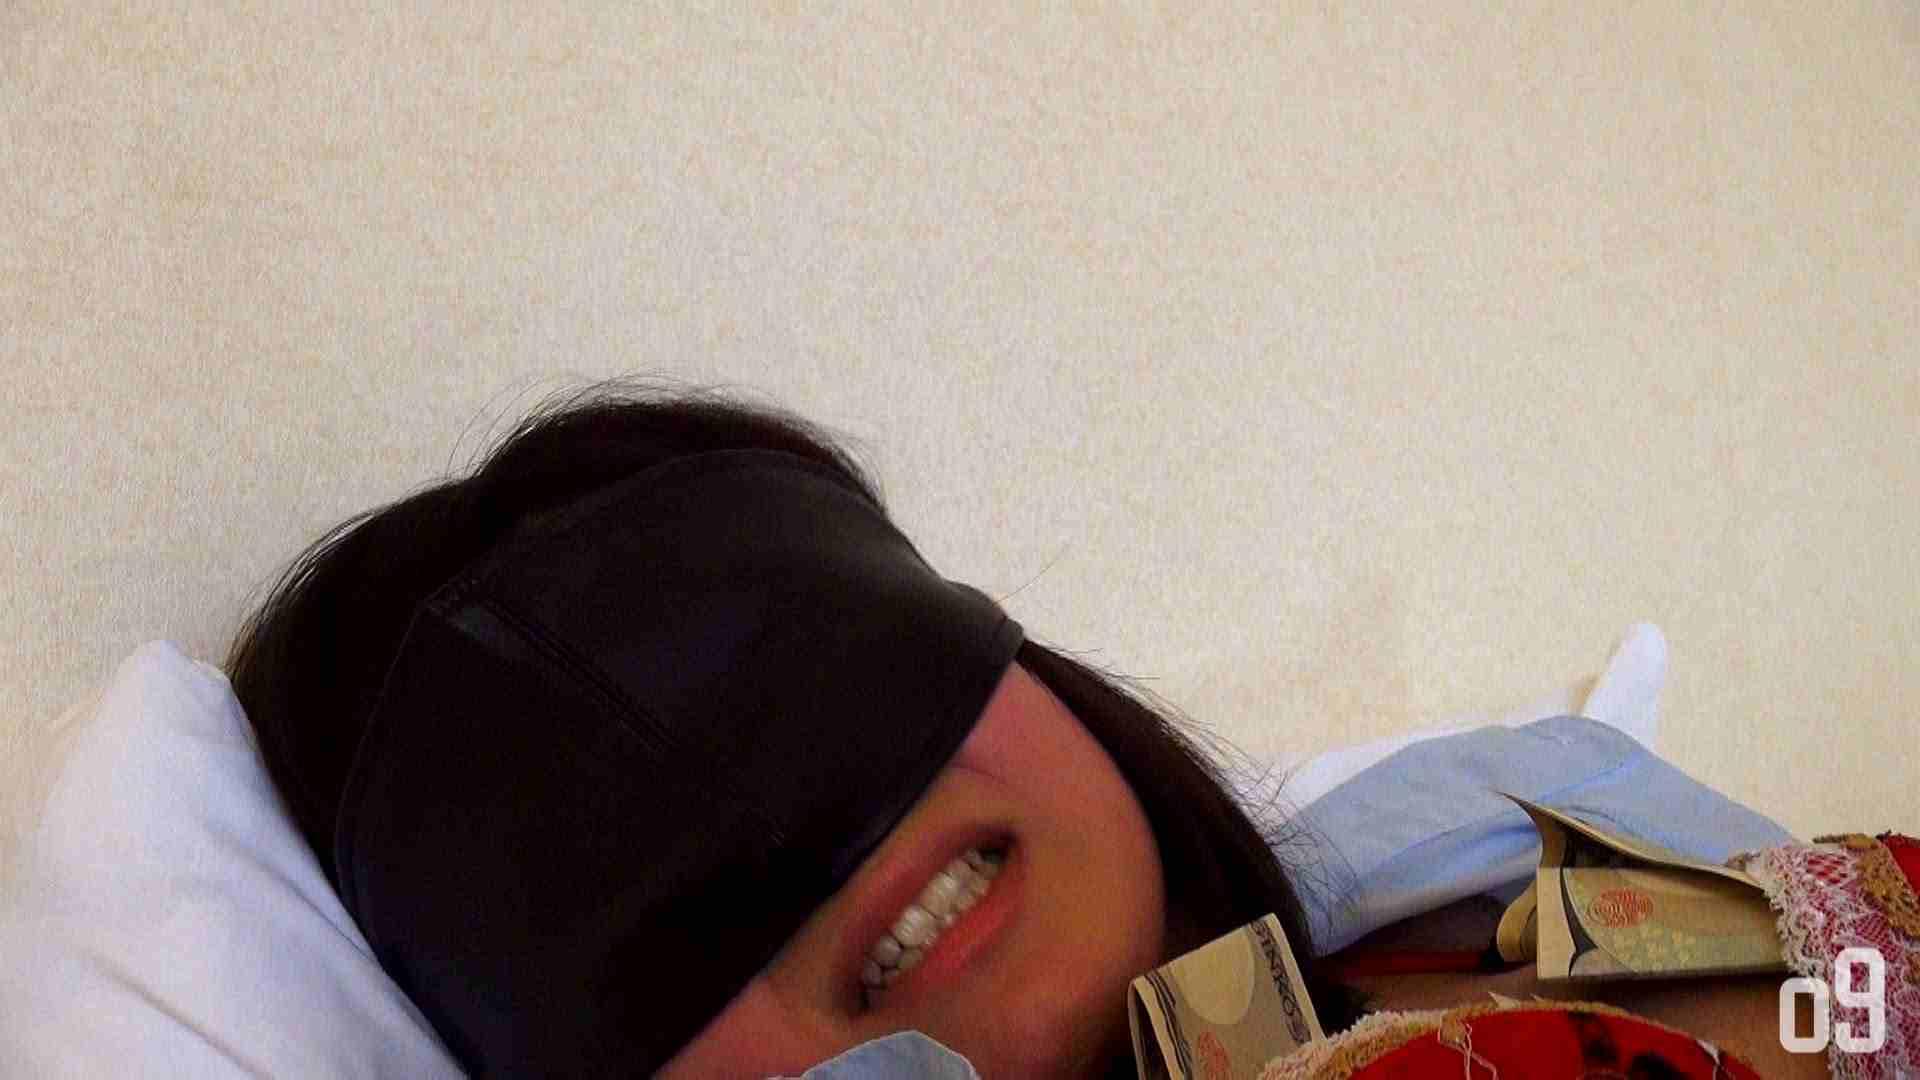 vol.6 TKSさんが震える!留華ちゃんの不慣れな手コキで念願の射精! 顔出しNG一般女性 | エッチなOL  99pic 13